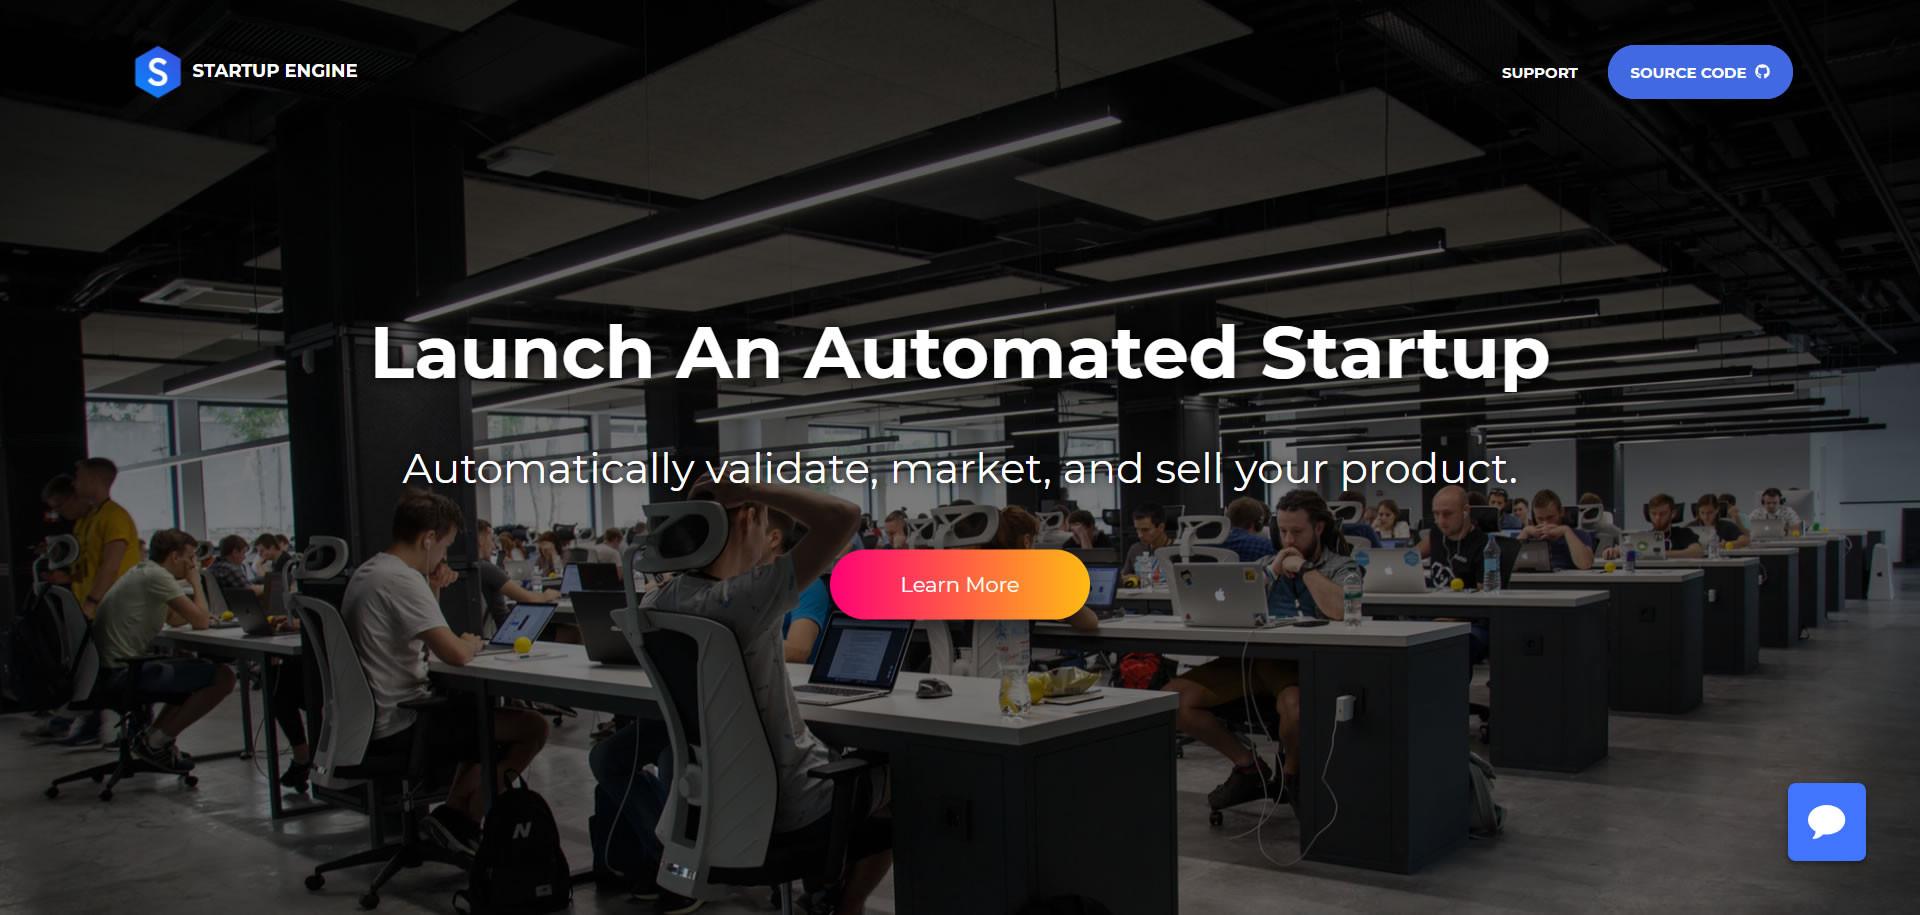 Startup Engine